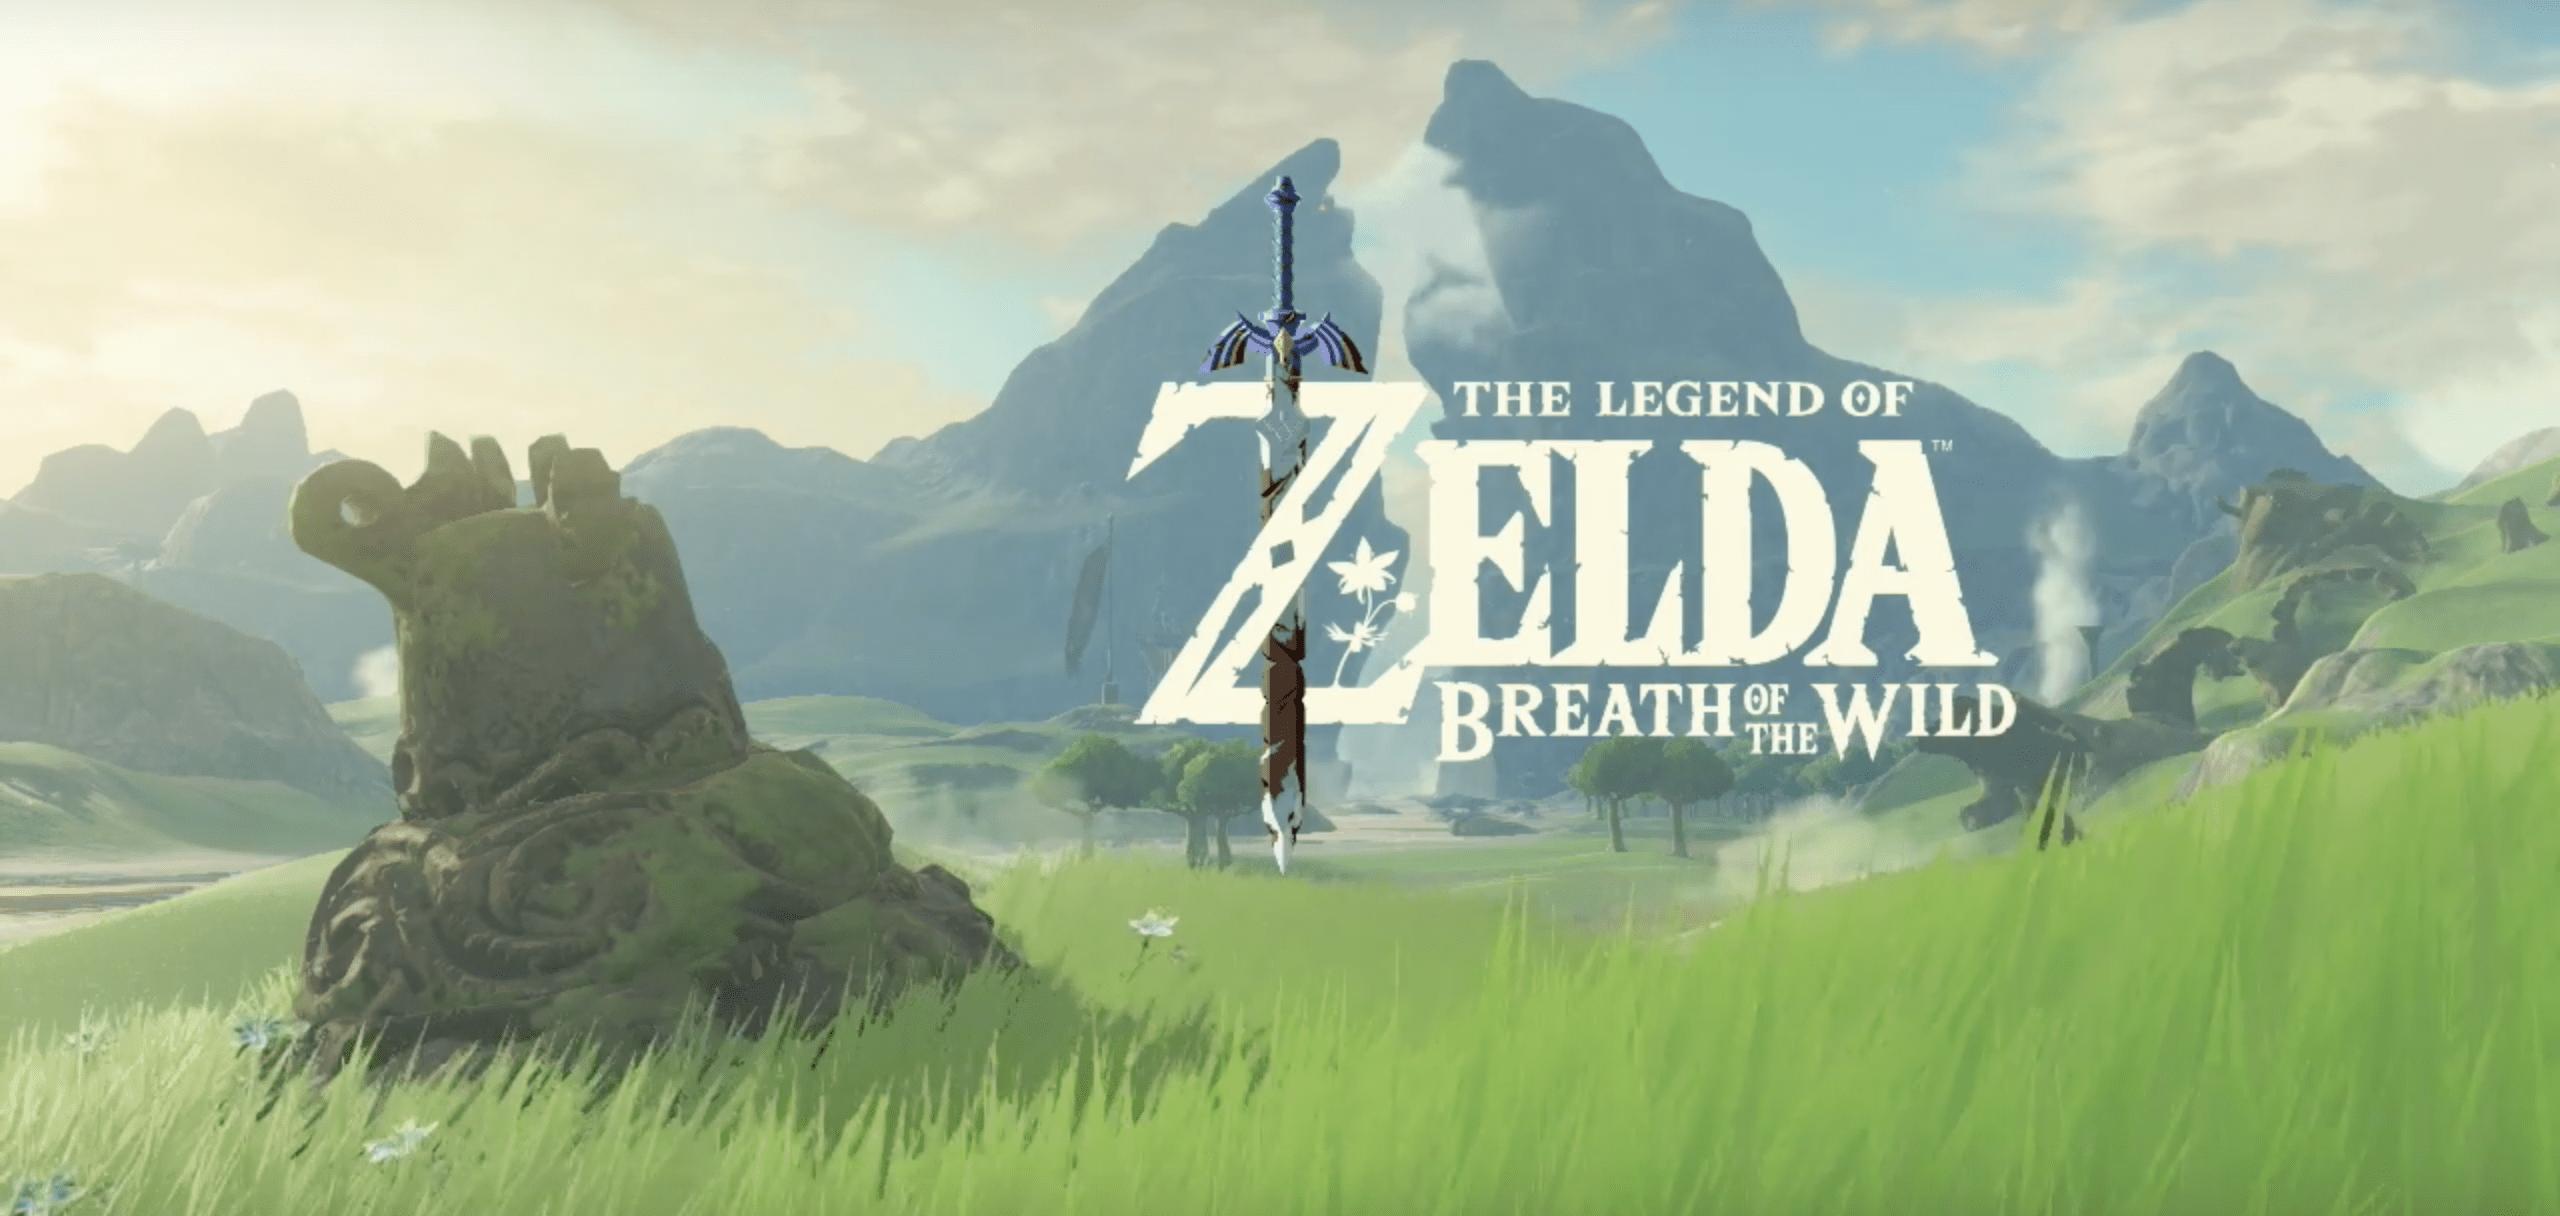 The Legend of Zelda Breath of The Wild Nintendo News E3 My Geek Actu Cover